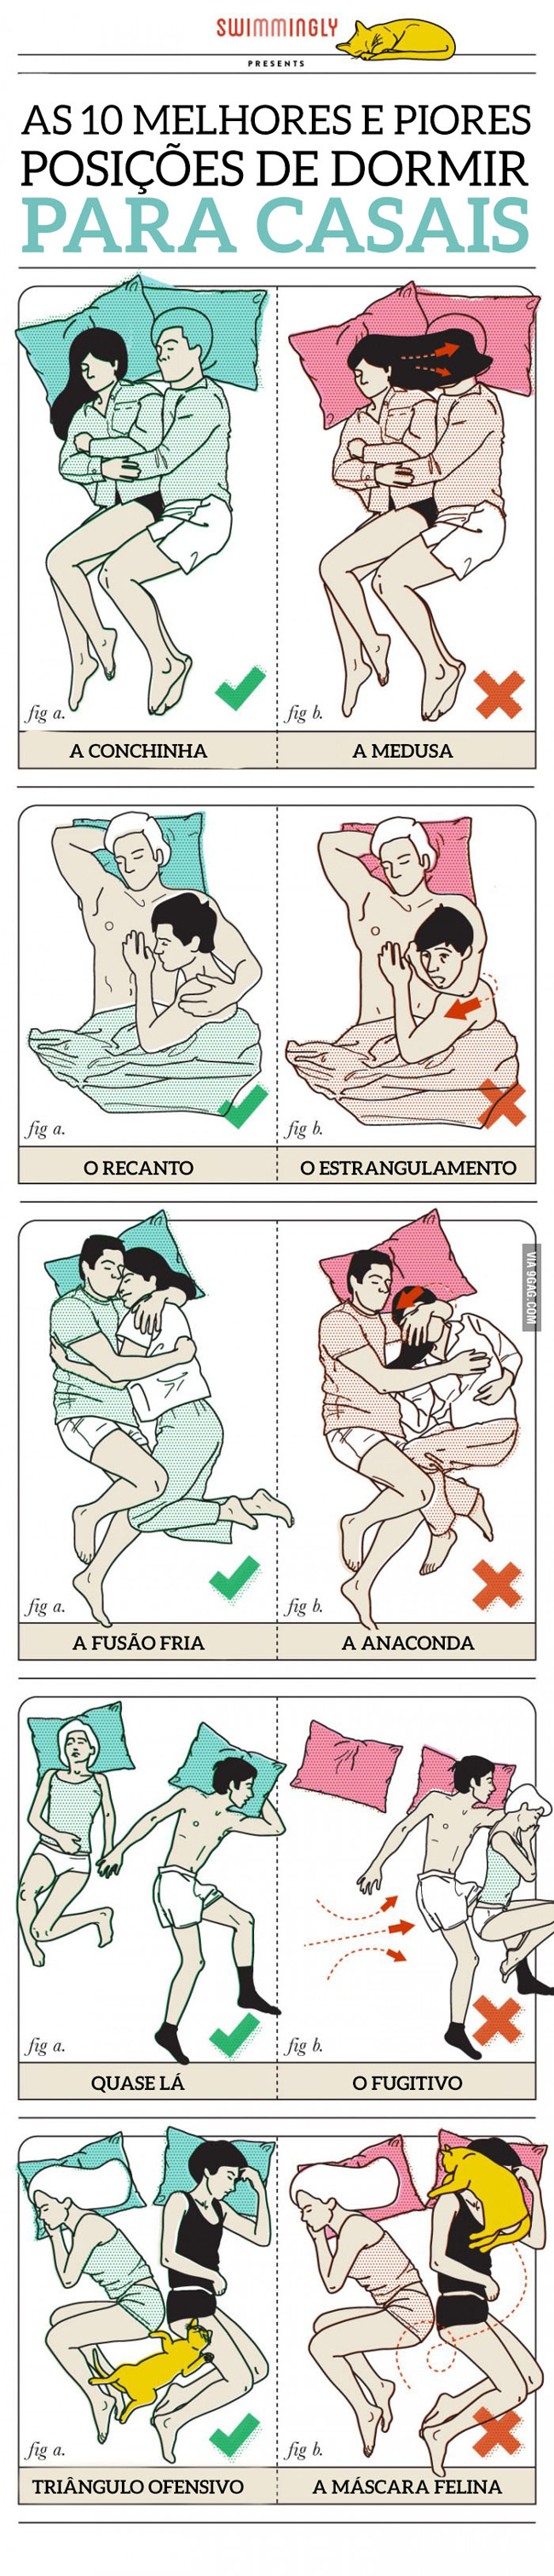 posições dormir casal